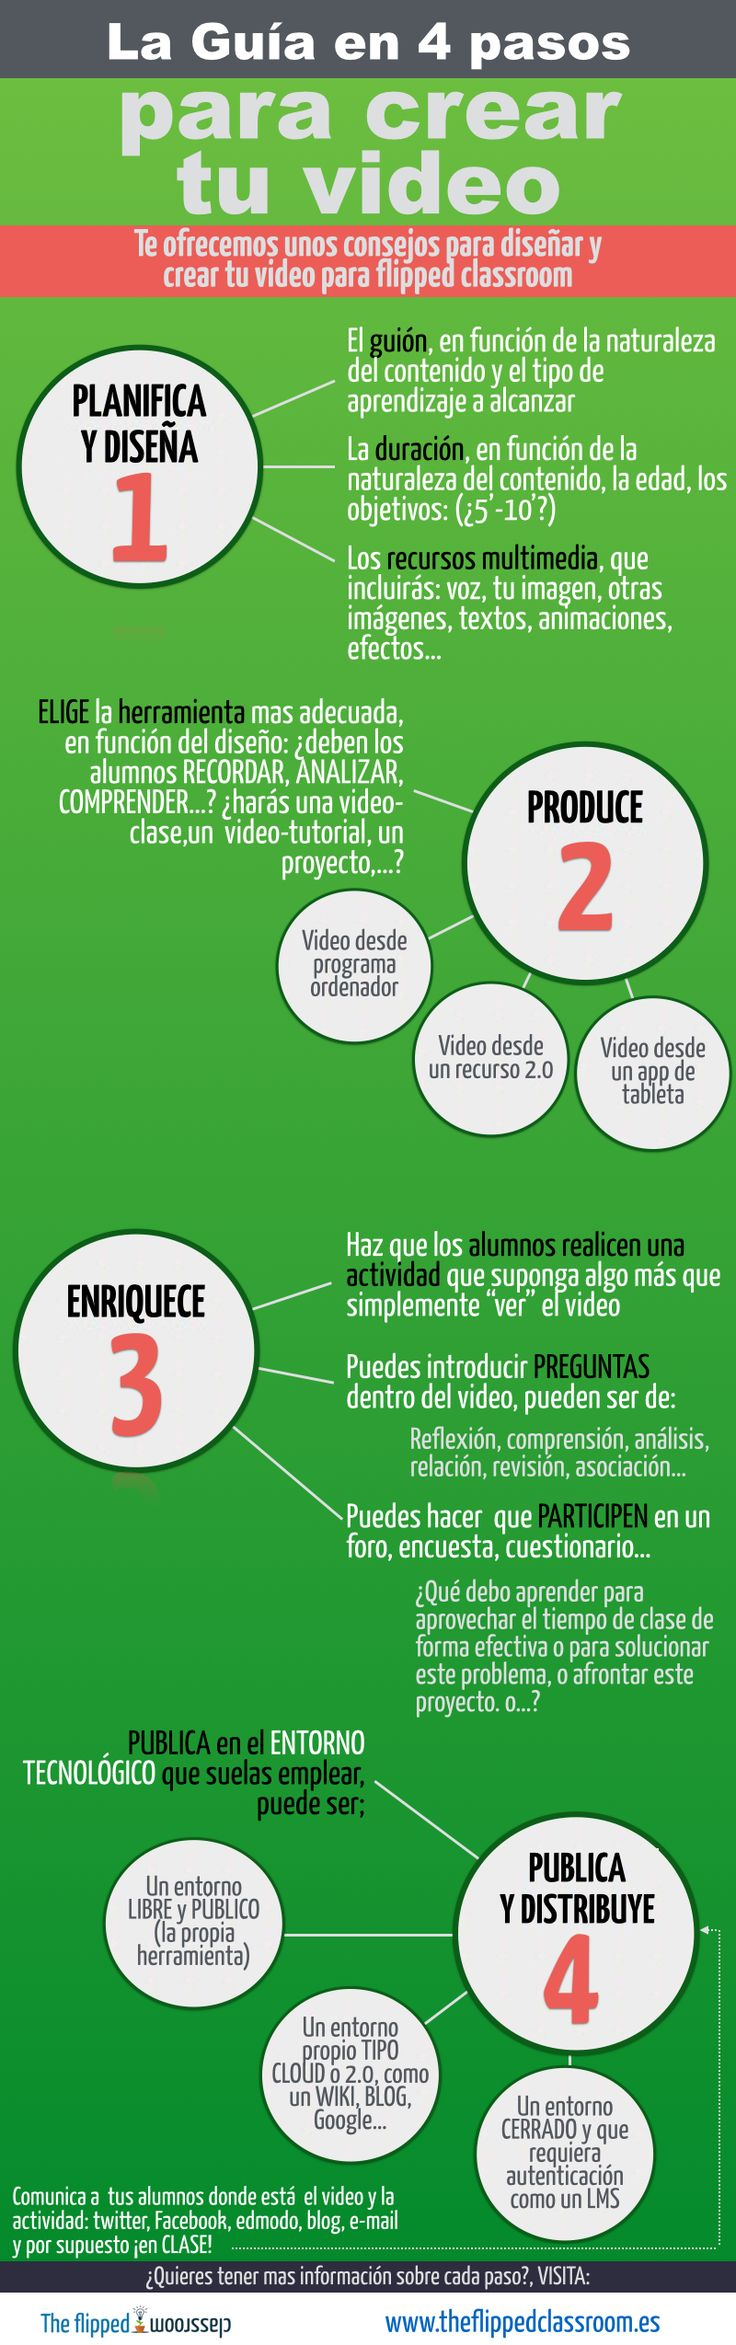 4 Pasos para crear tu vídeo